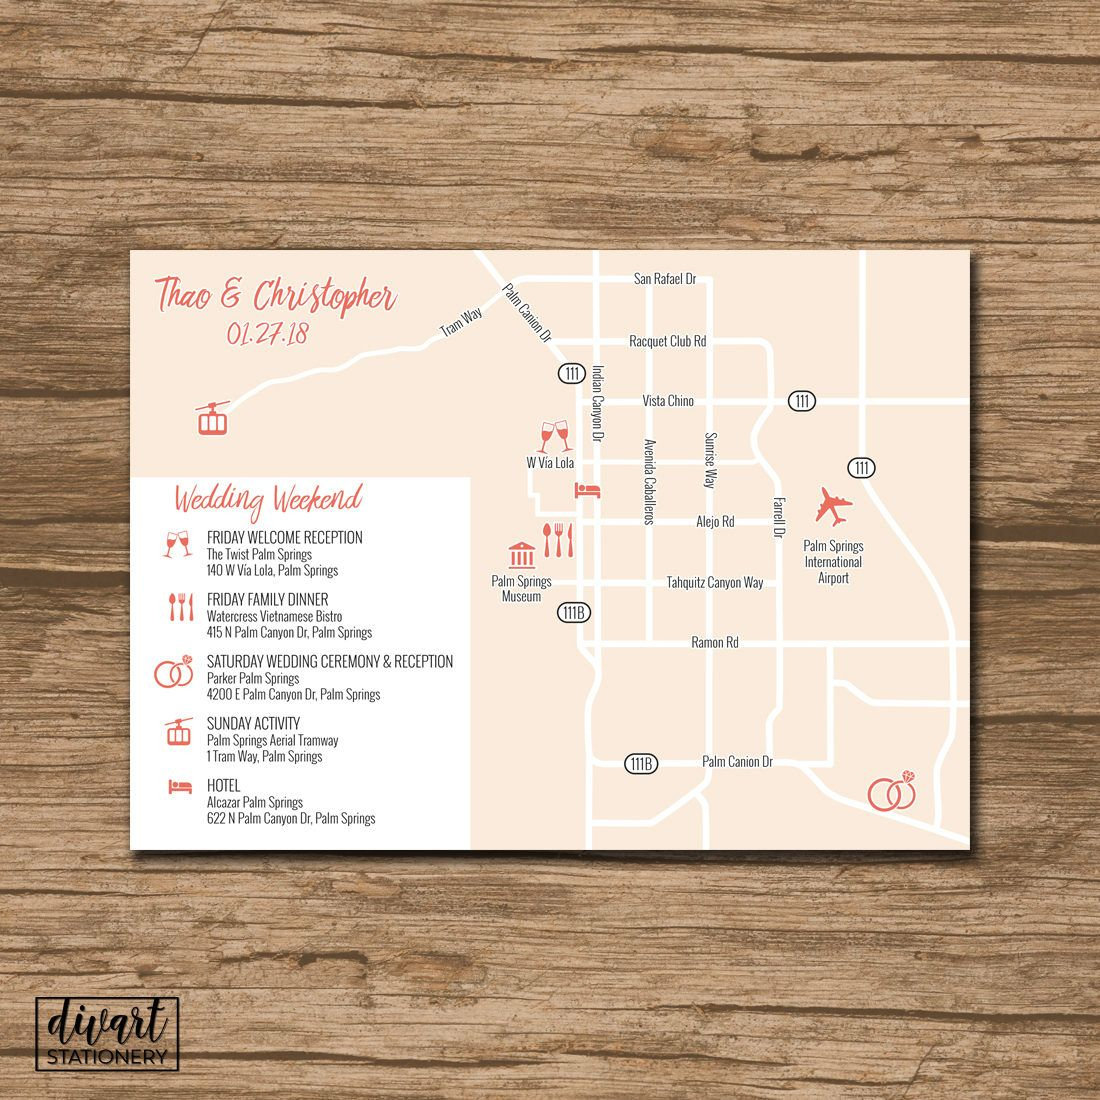 Custom Wedding Map, Event Map, Directions, Locations - Printable - Printable Map Directions For Invitations